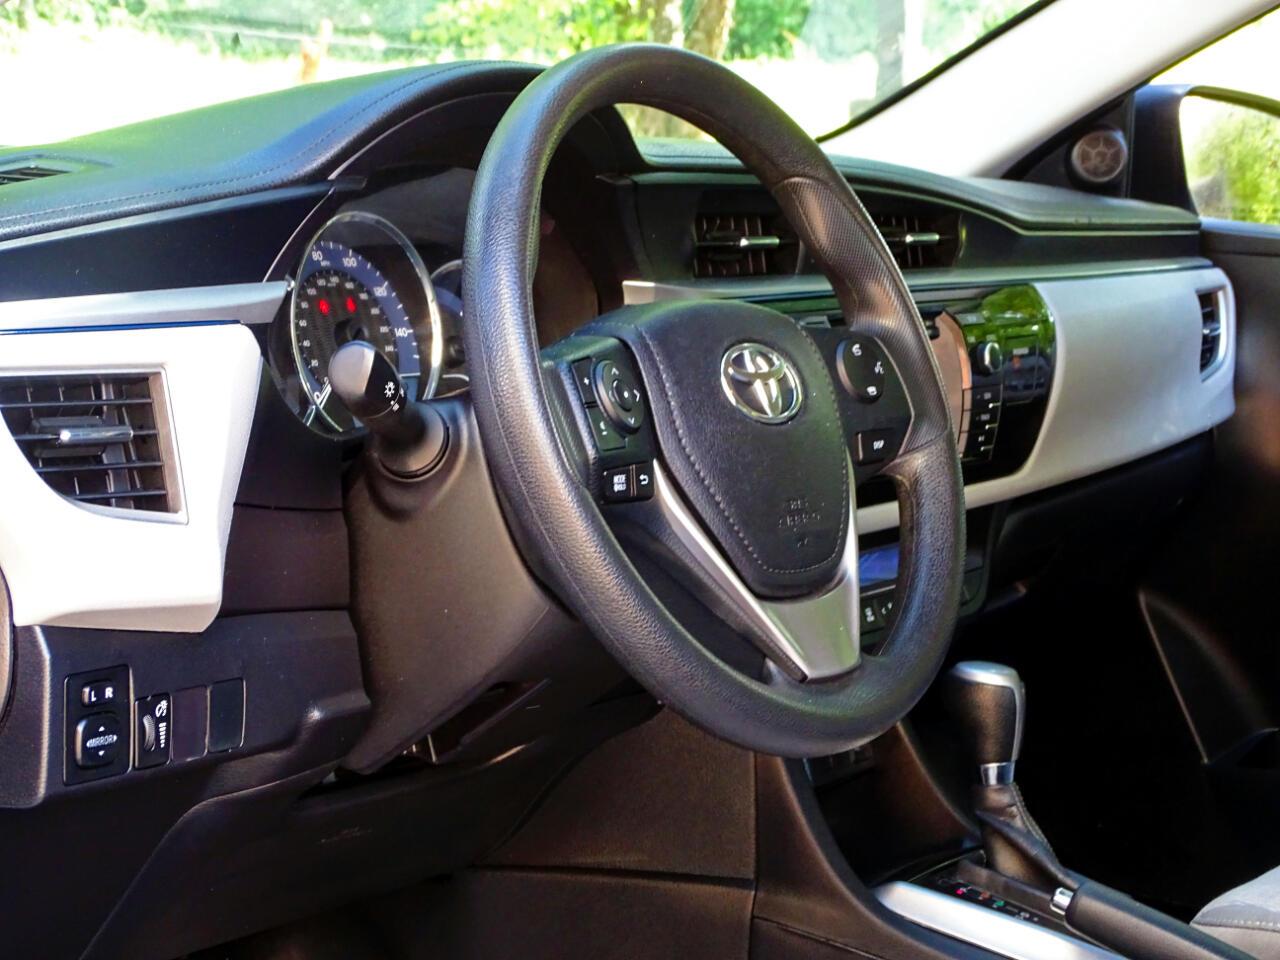 2016 Toyota Corolla 4dr Sdn CVT S w/Special Edition Pkg (Natl)